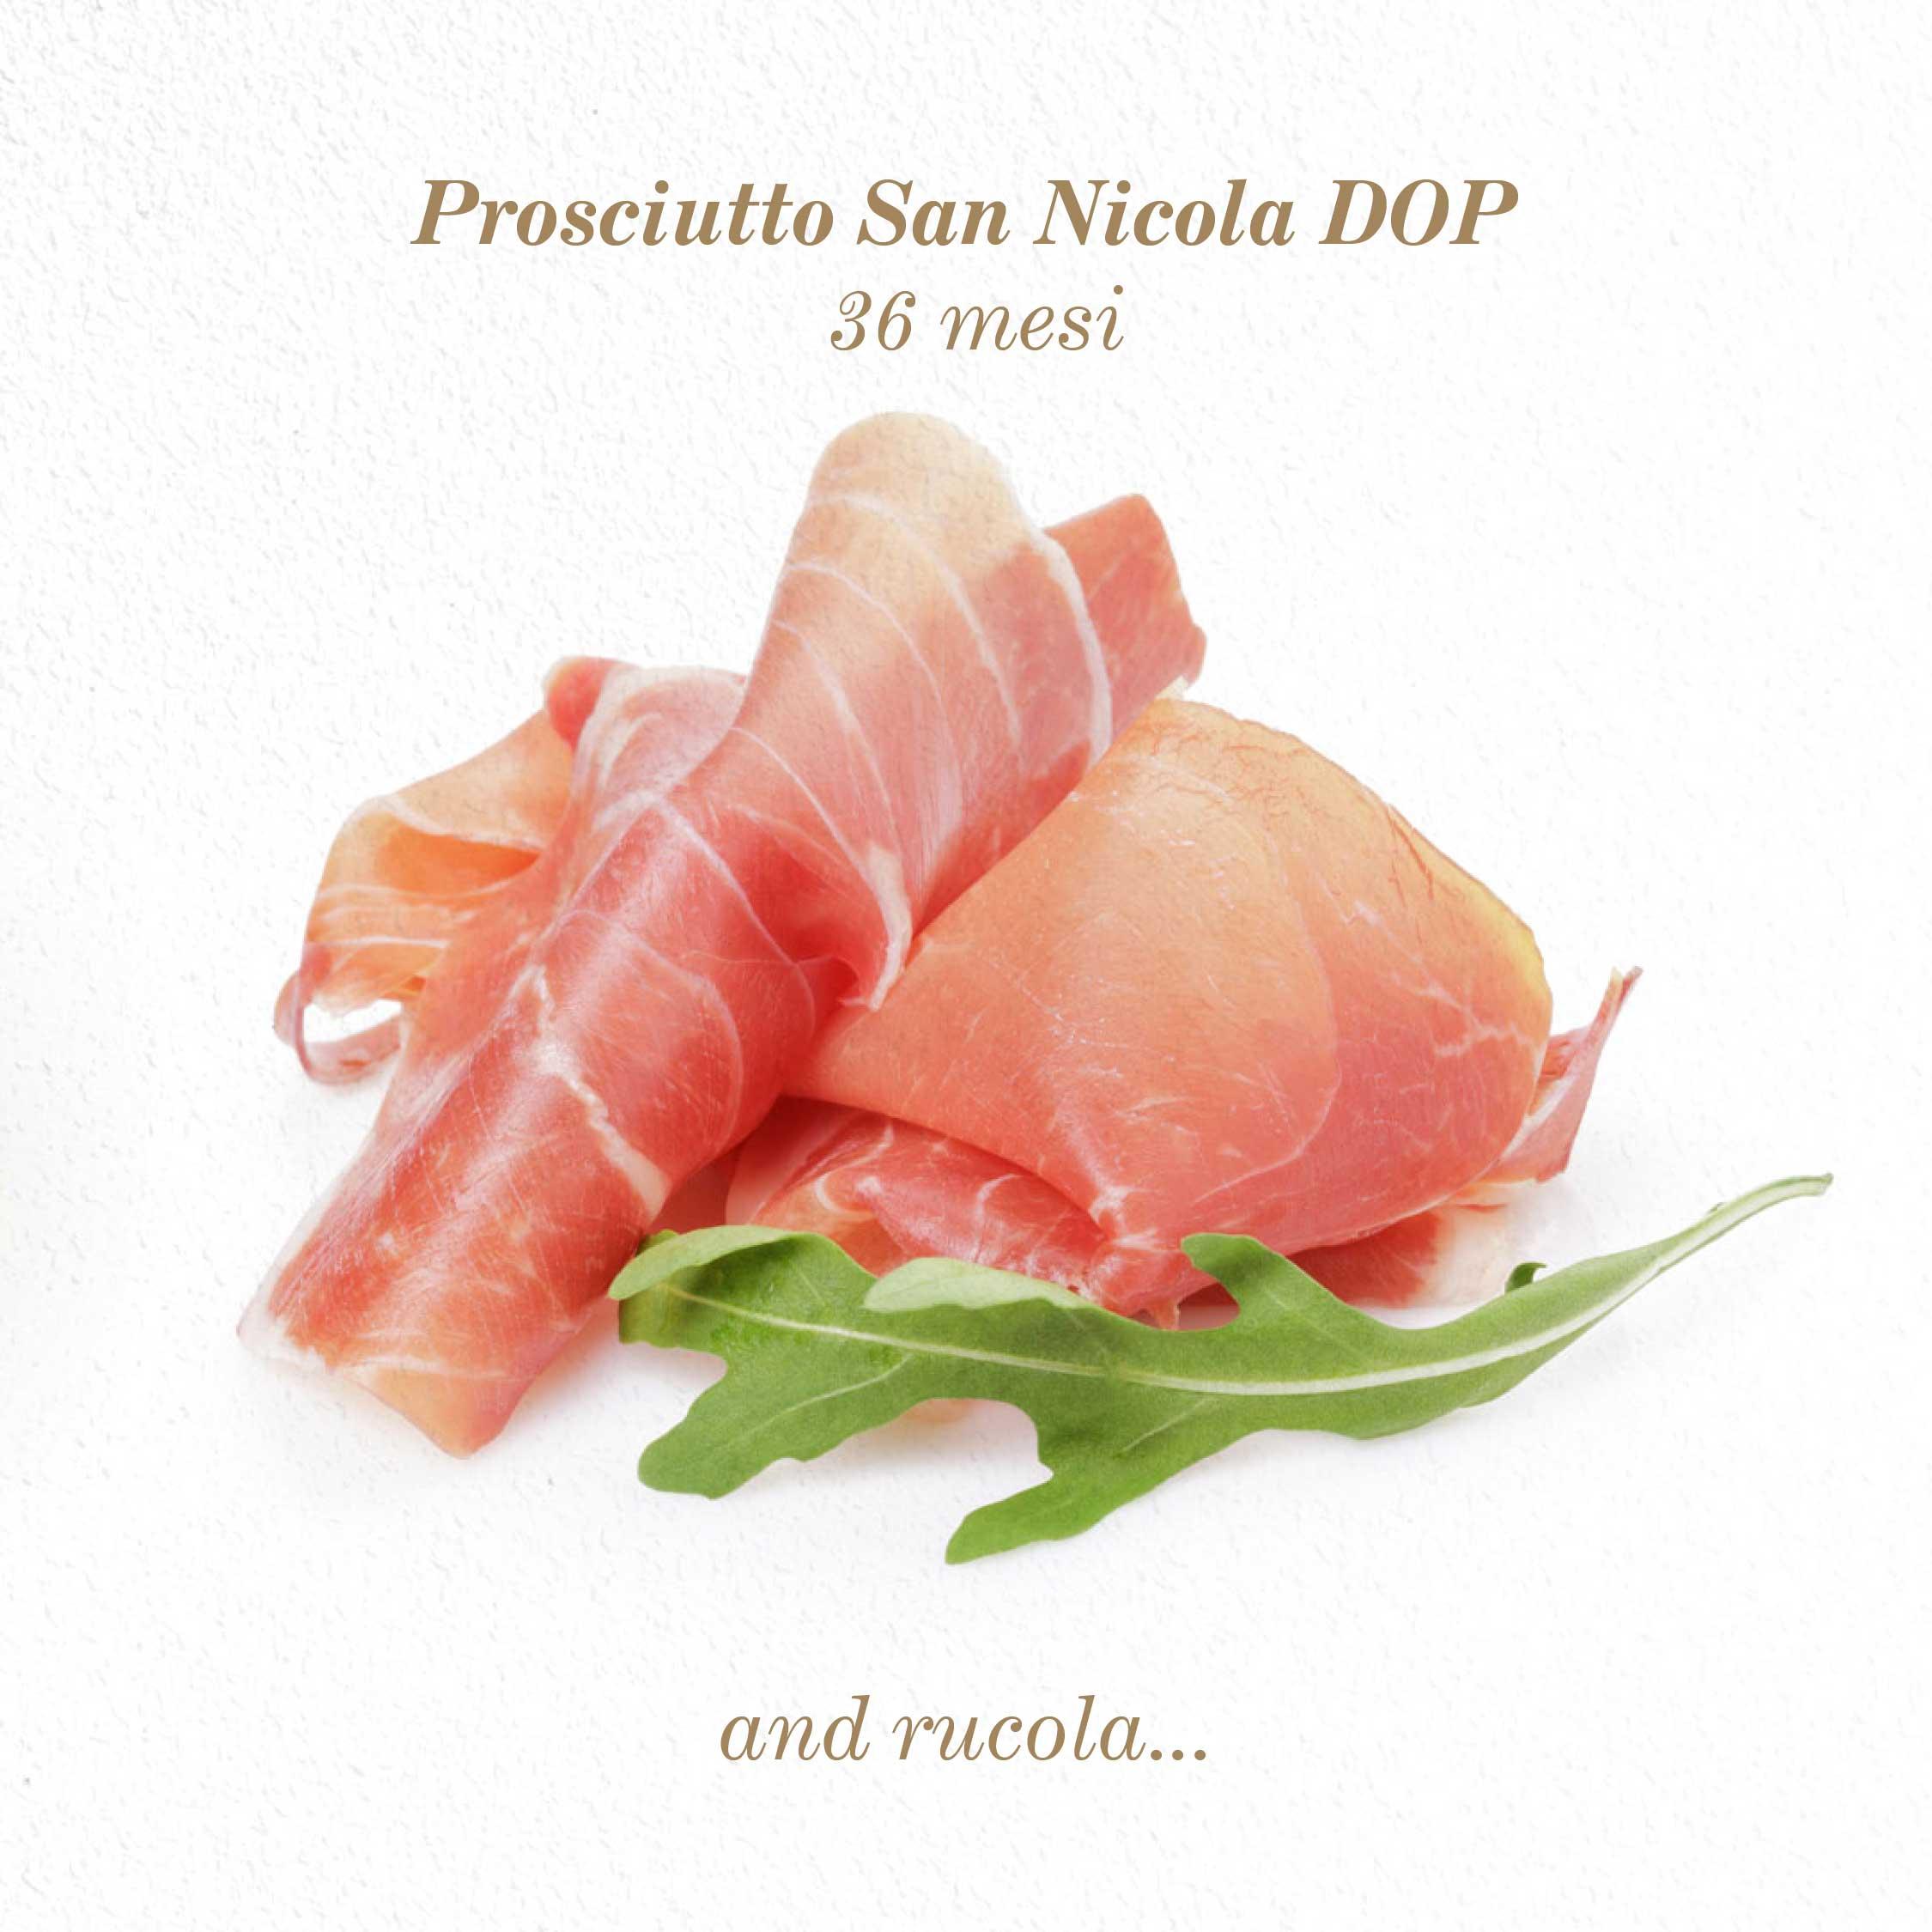 Panino time with Prosciutto San Nicola